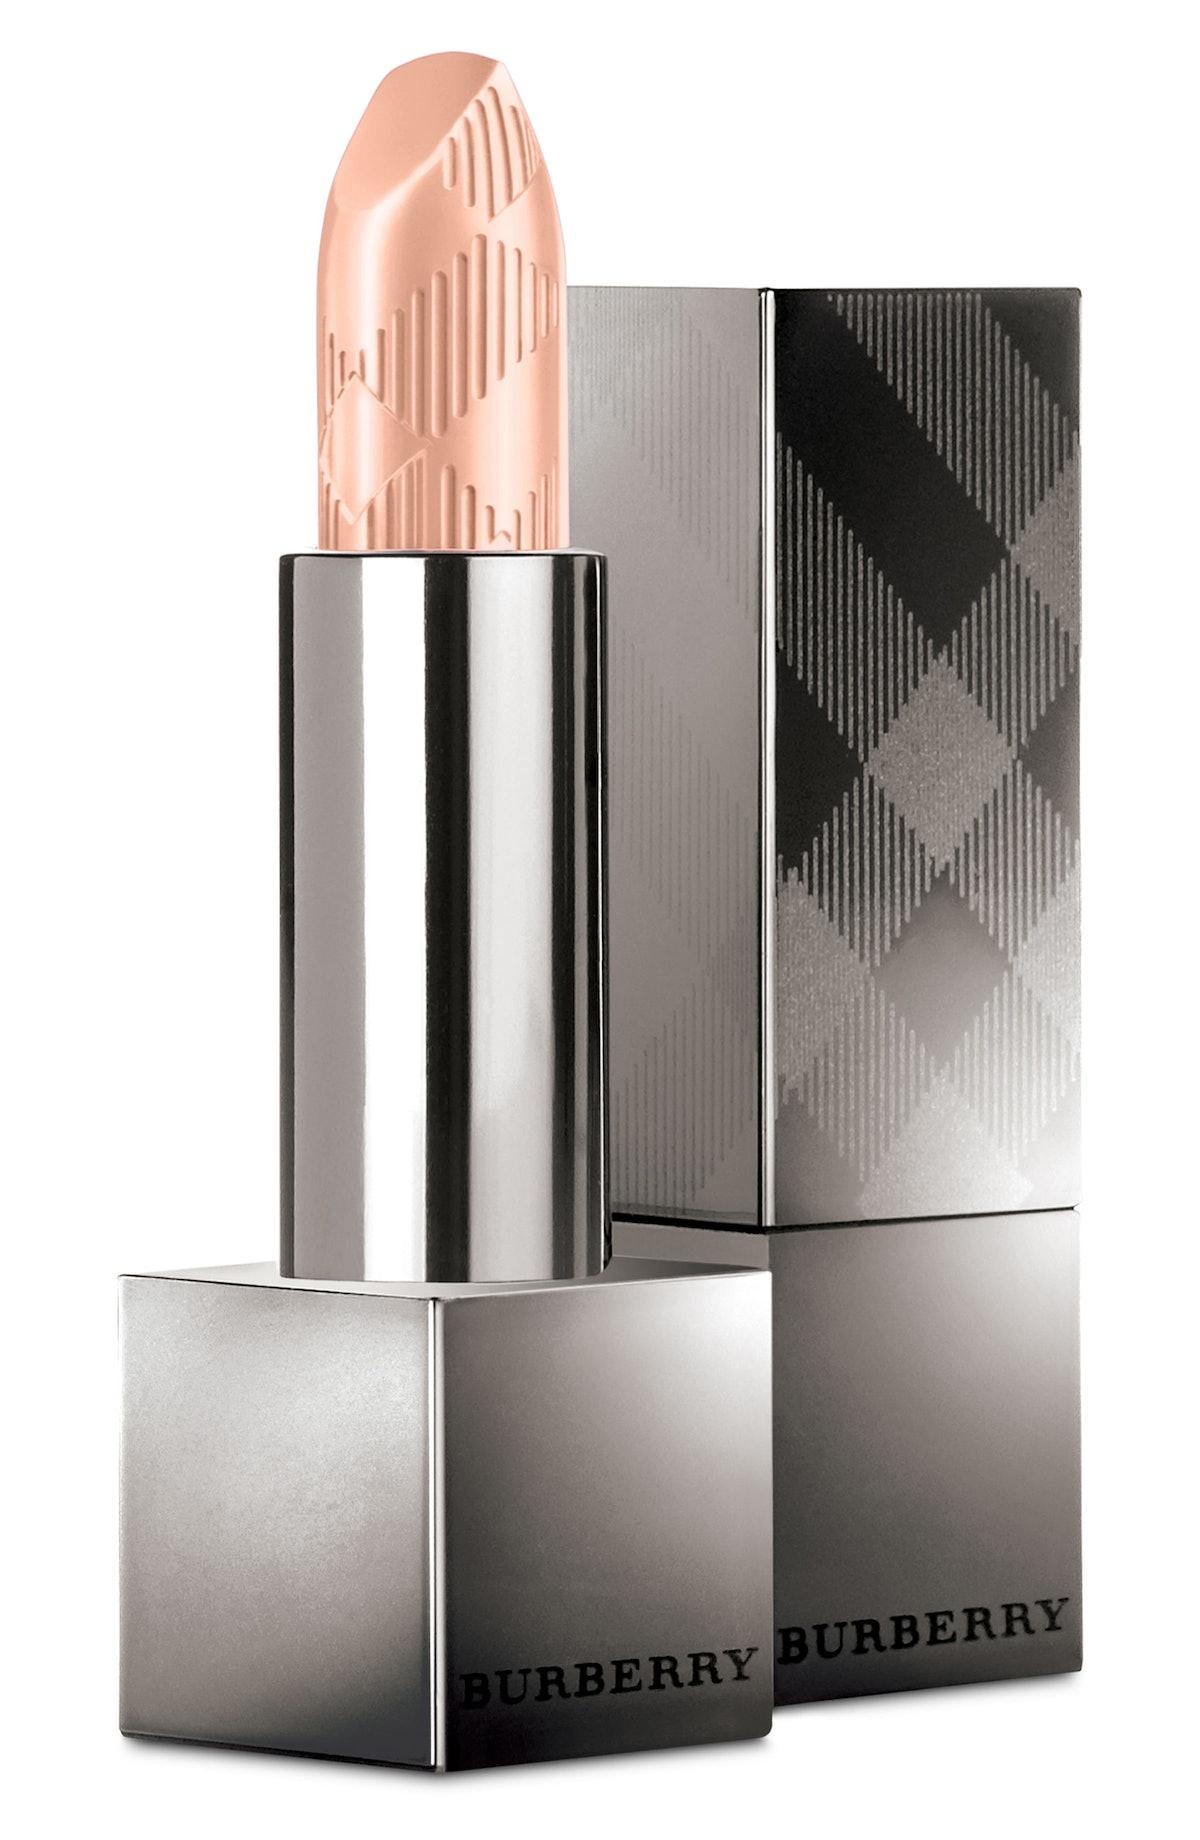 Burberry Beauty Kisses Lipstick in Nude Beige